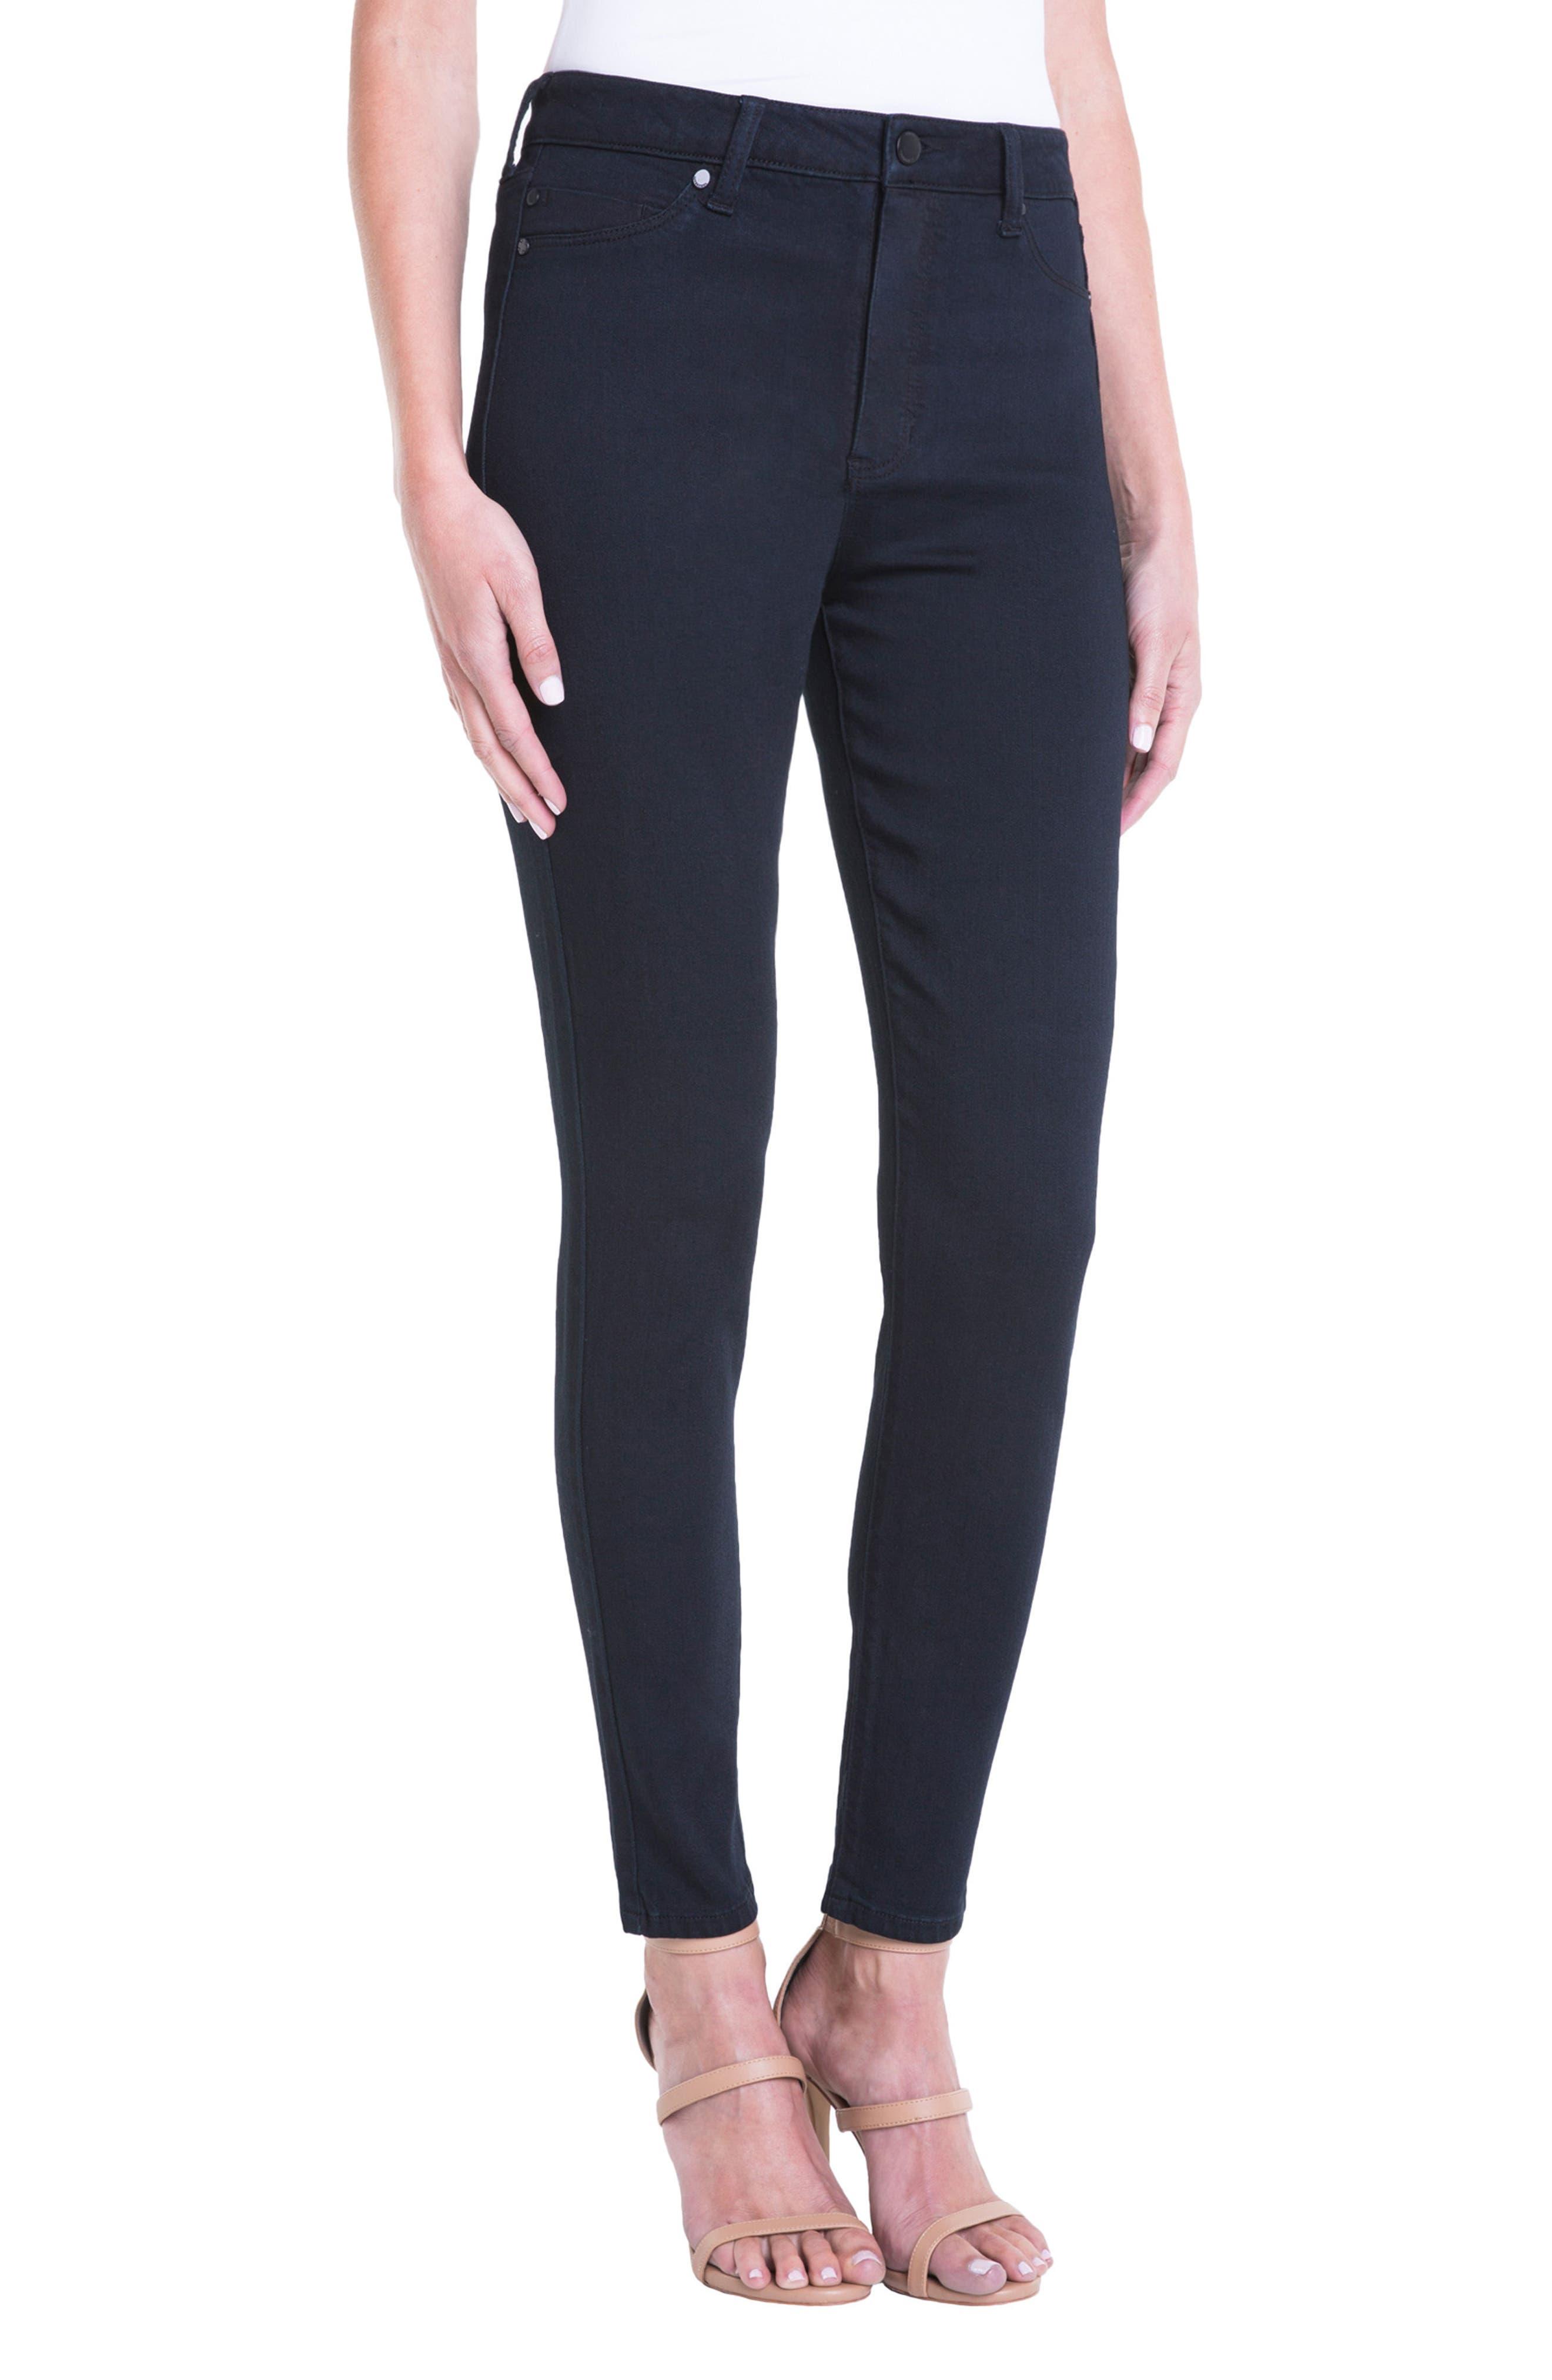 Jeans Company Bridget High Waist Skinny Jeans,                             Alternate thumbnail 3, color,                             Indigo Over Dye Black